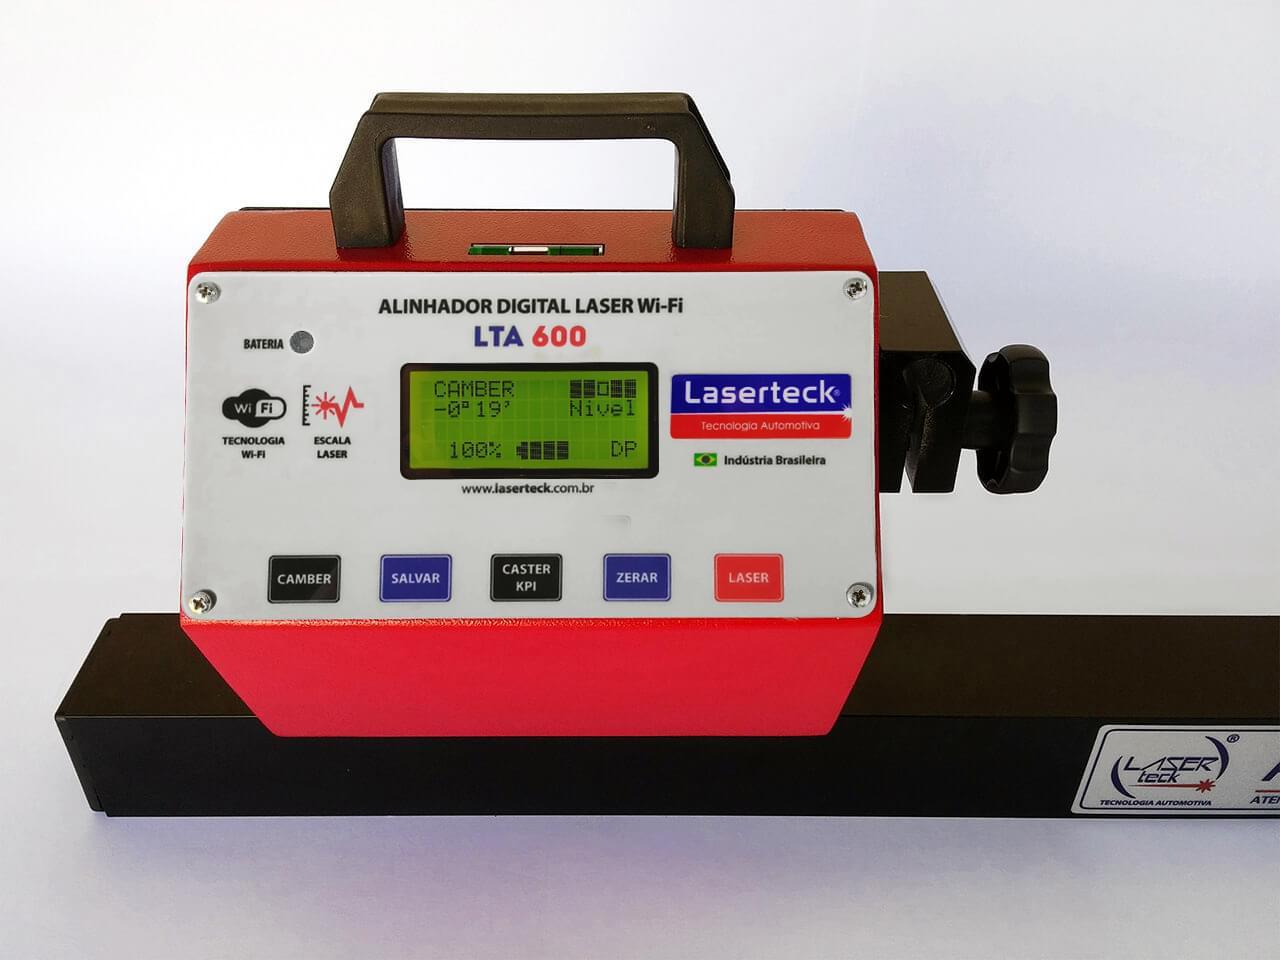 Alinhador digital LTA 600 WiFi - Truck